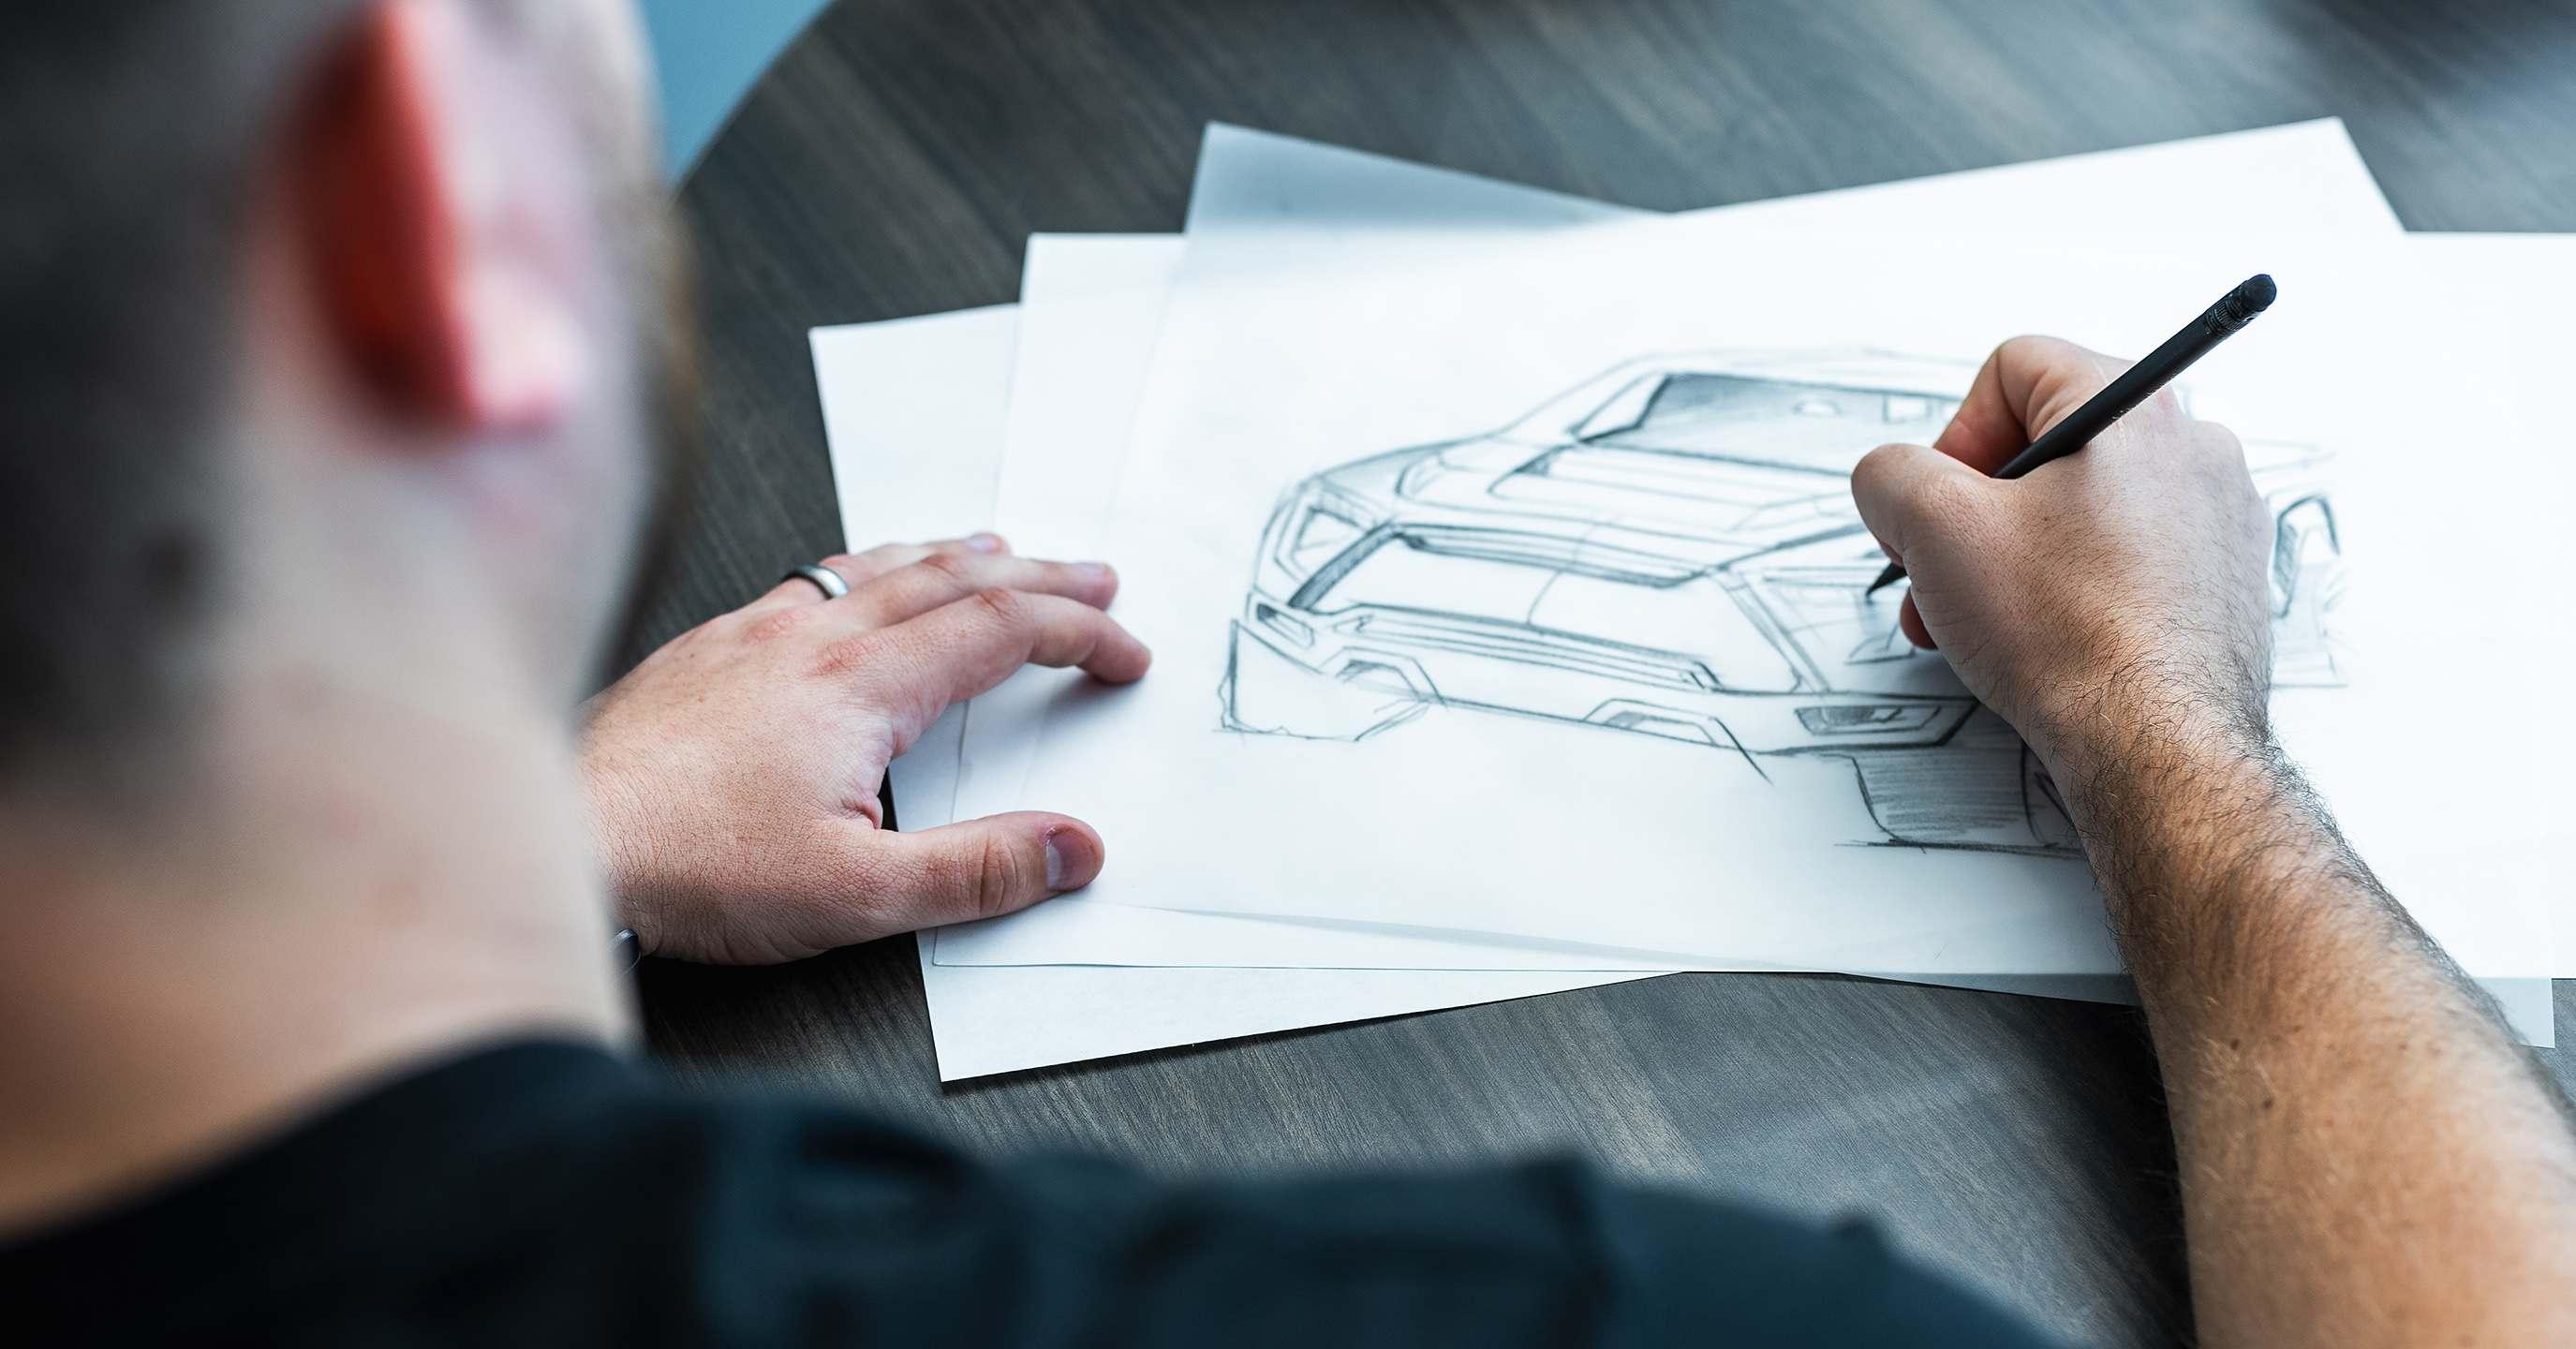 Nikola vehicle design jobs